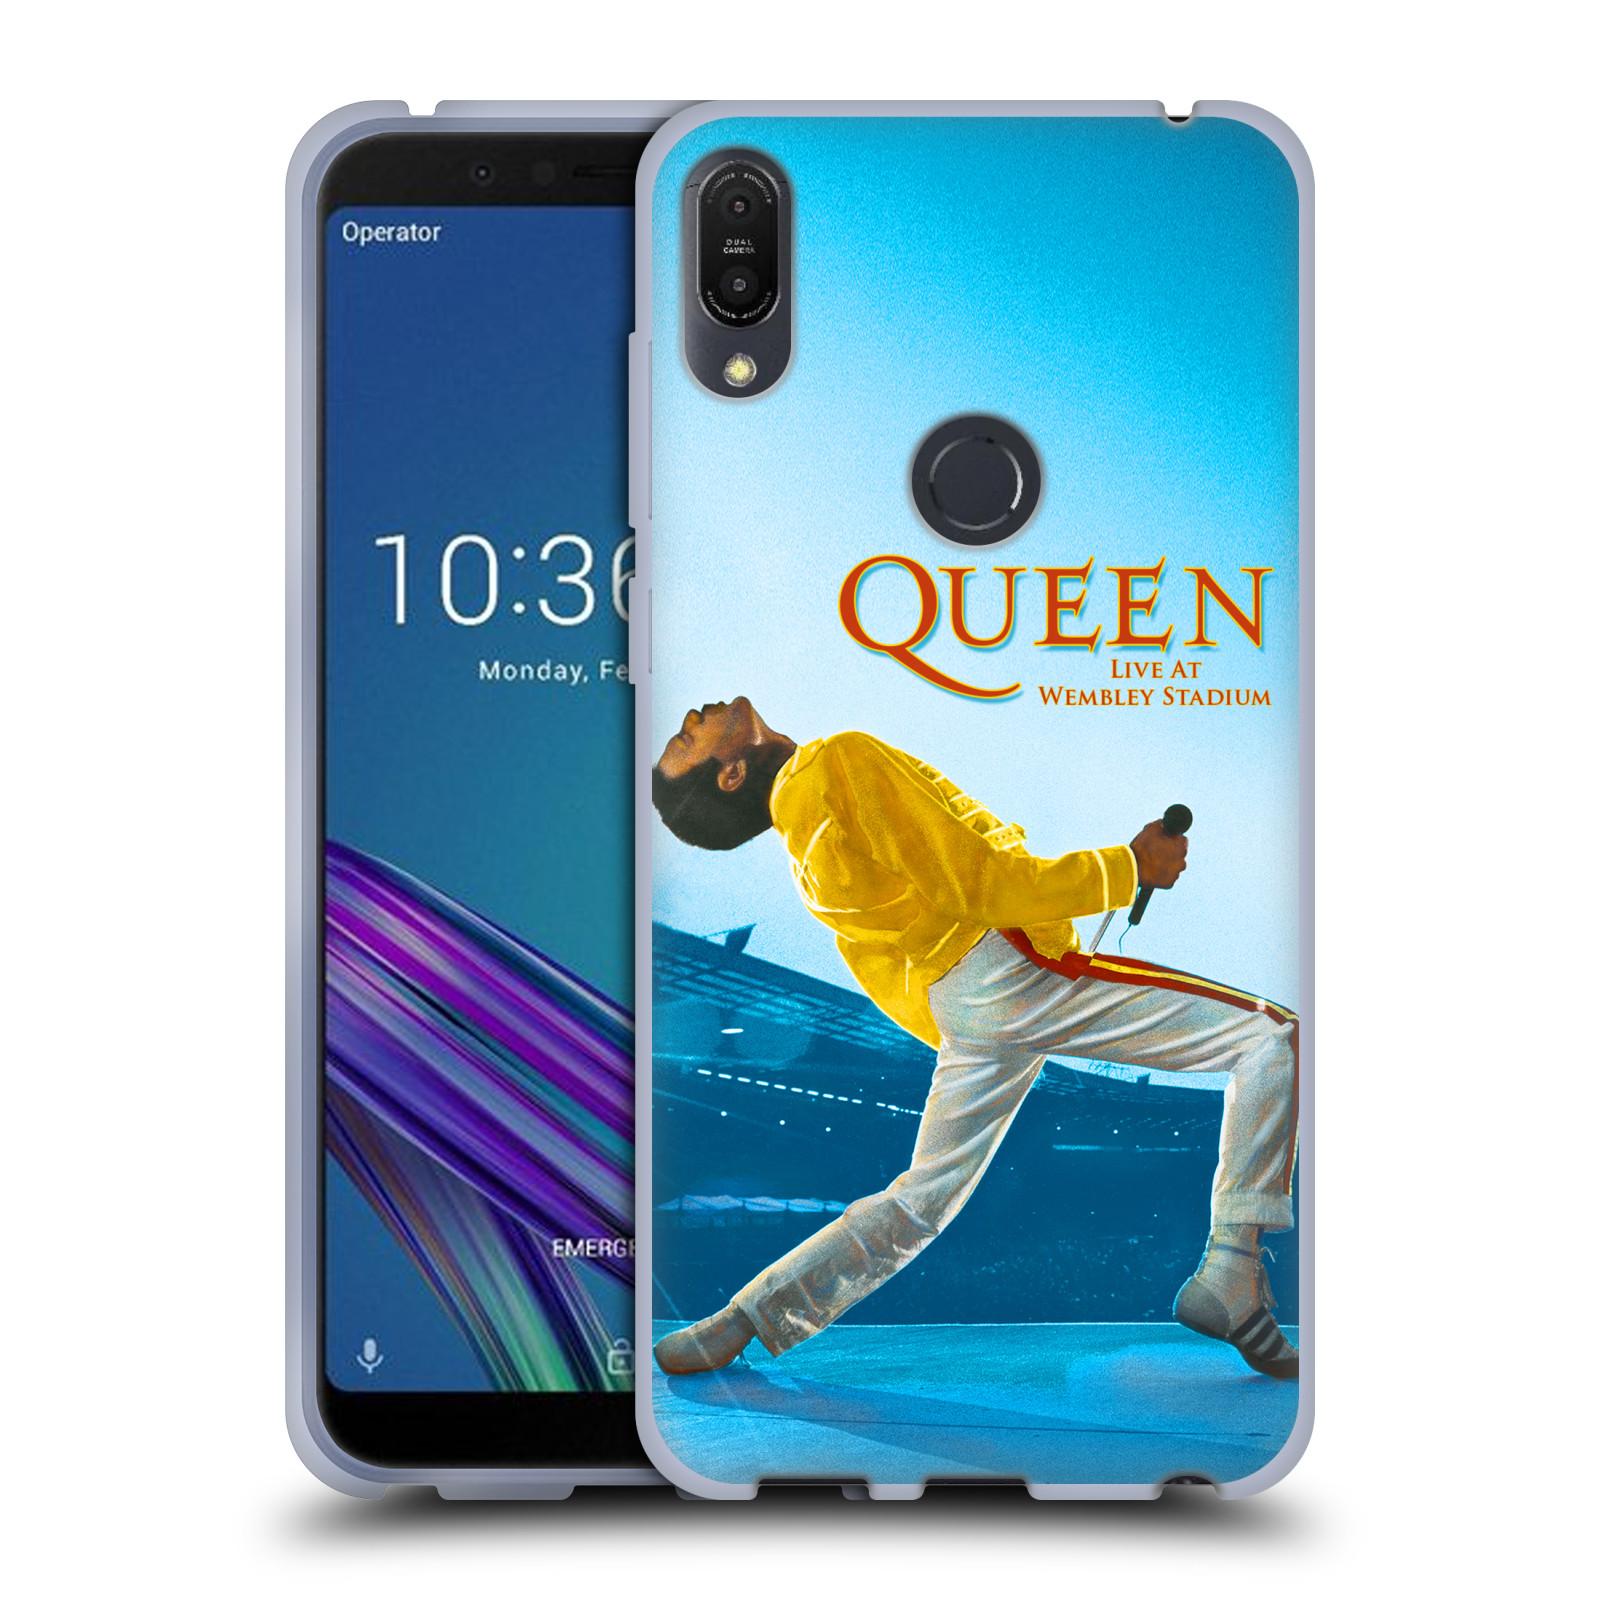 Silikonové pouzdro na mobil Asus ZenFone Max Pro (M1) - Head Case - Queen - Freddie Mercury